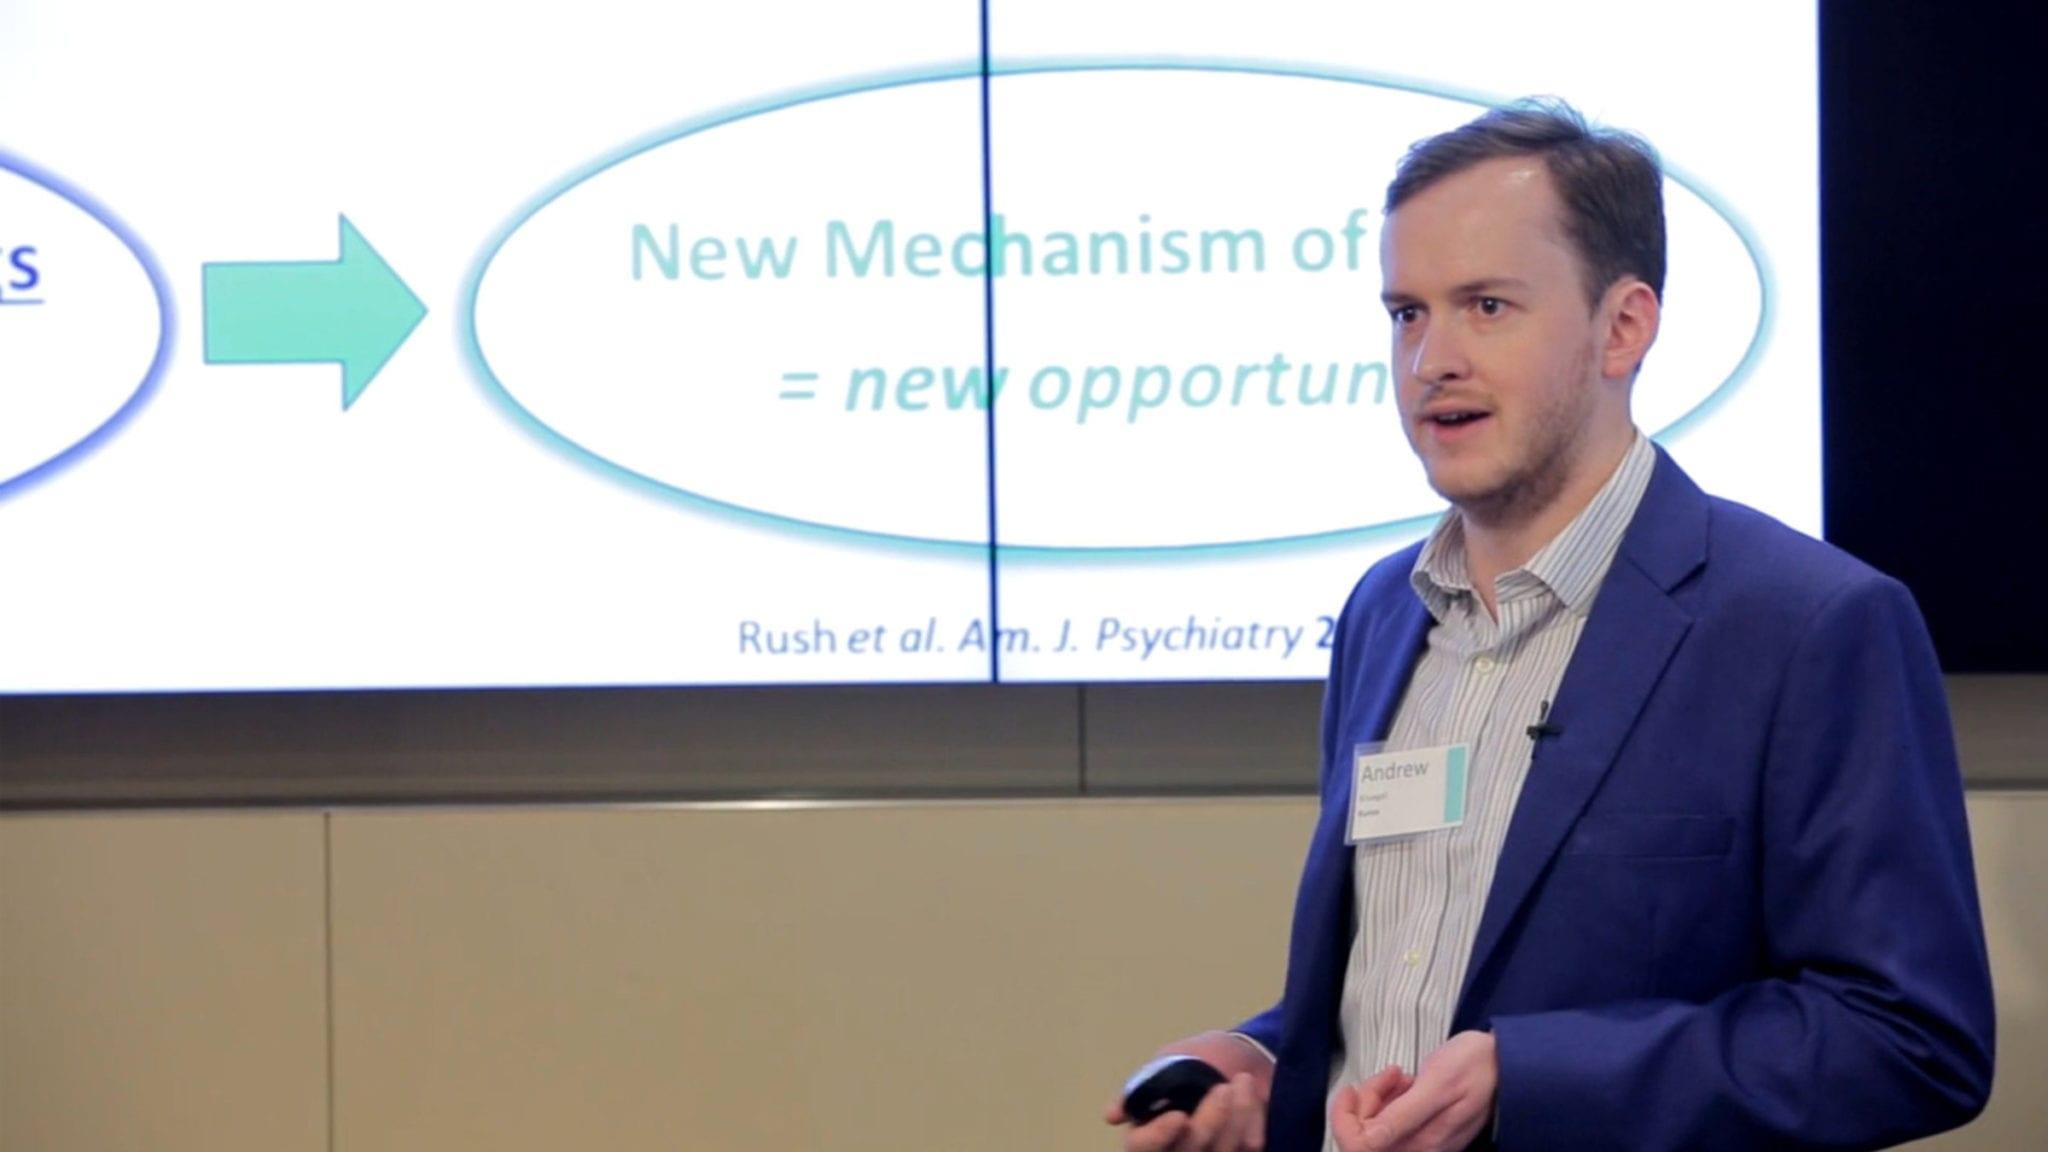 After psilocybin and ketamine, a new biotech comes along developing a drug Scott Gottlieb fought